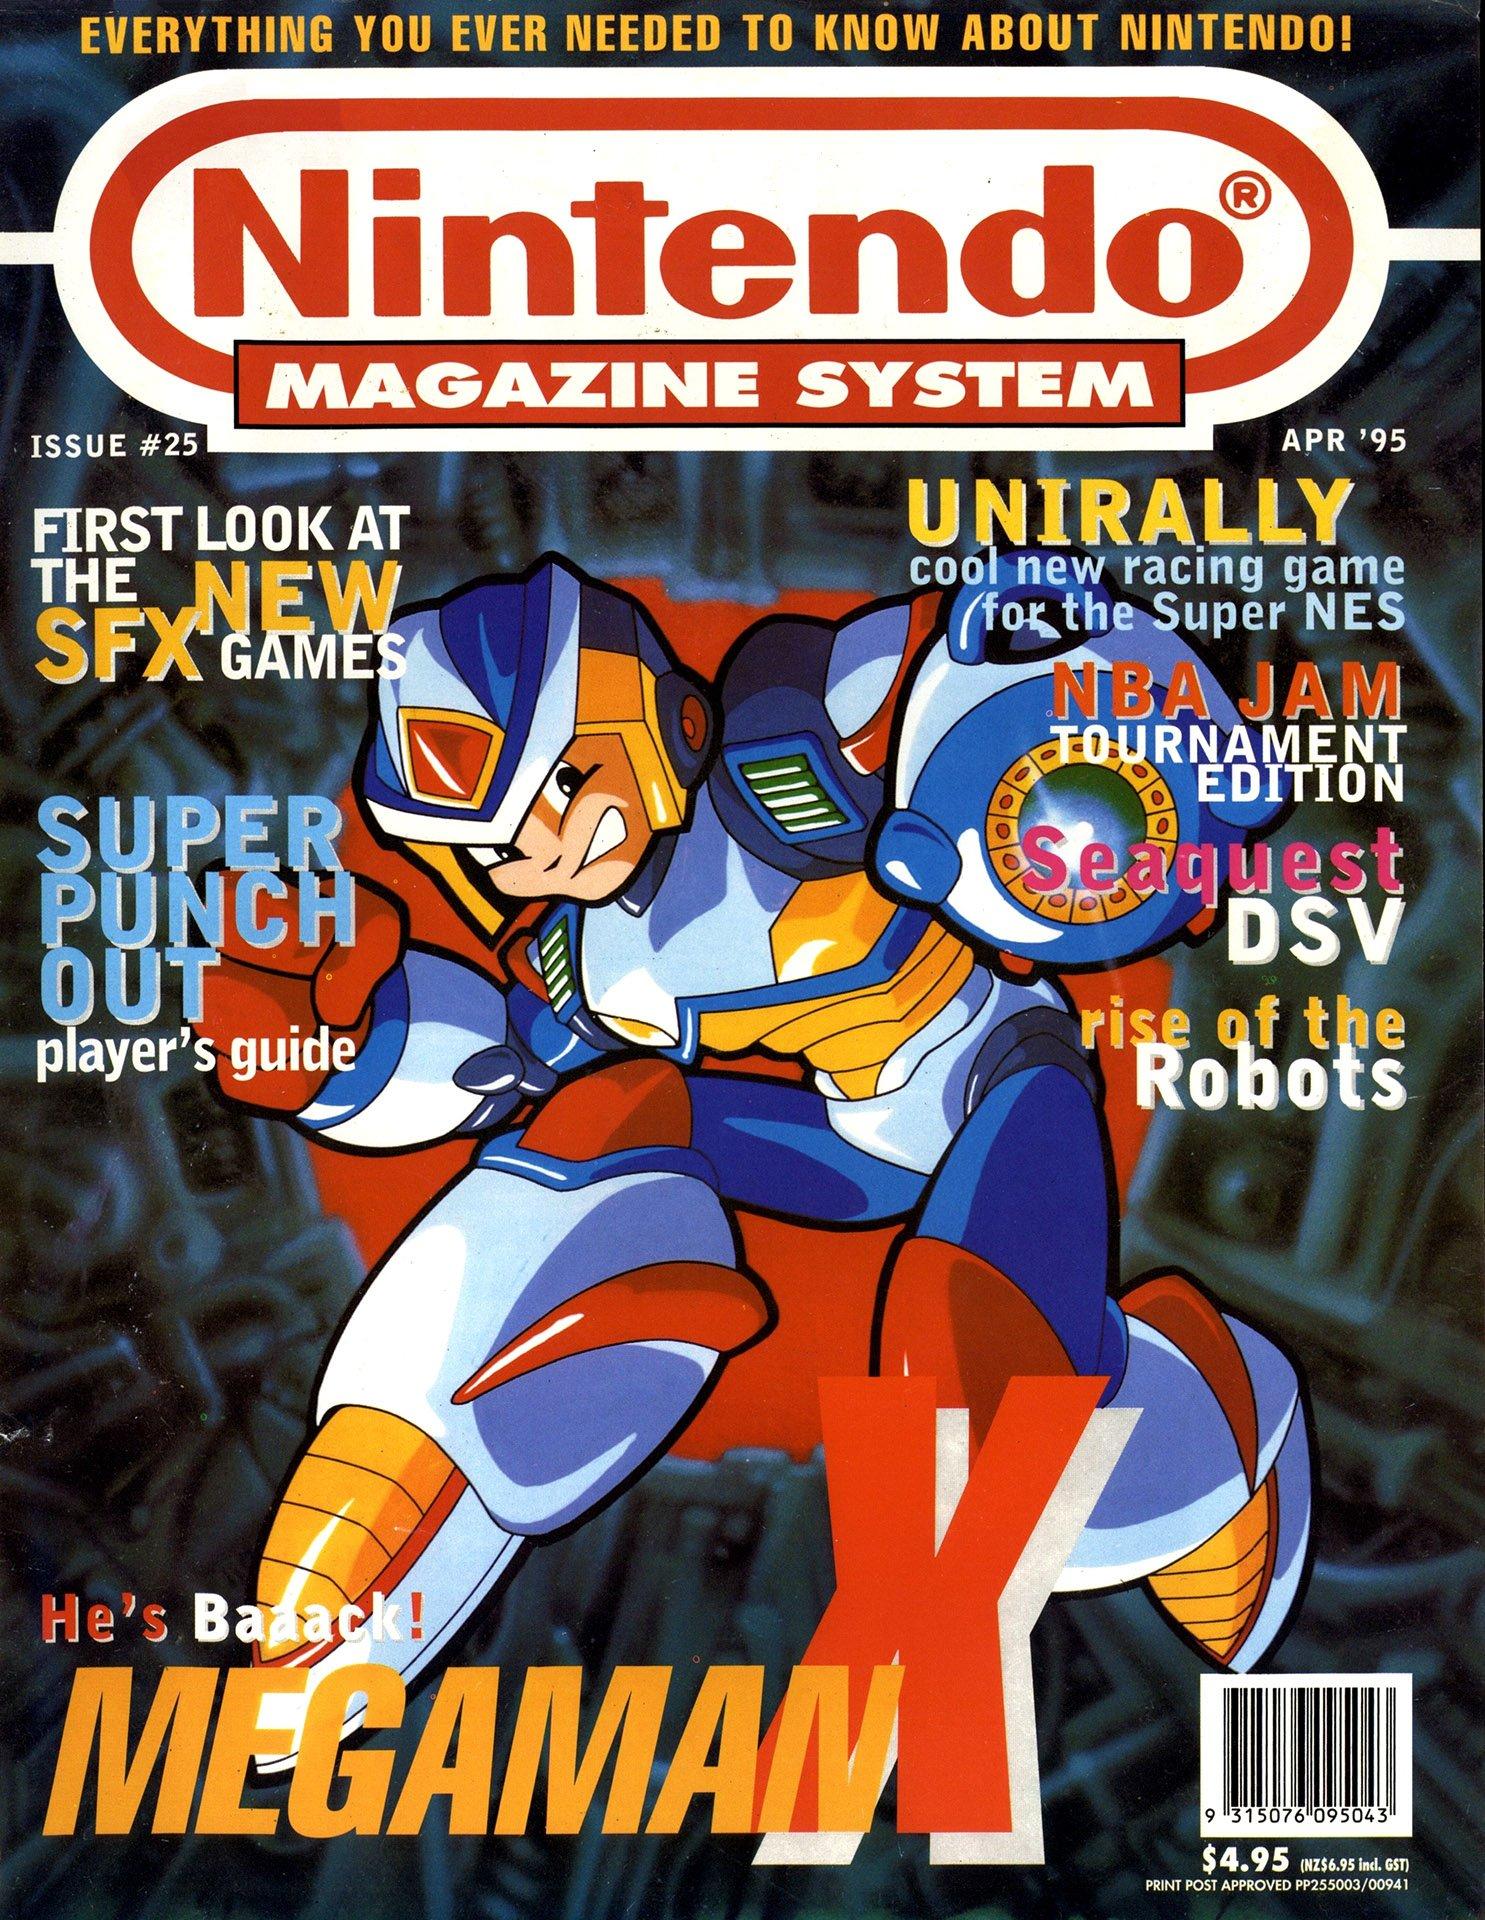 Nintendo Magazine System (AUS) 025 (April 1995)